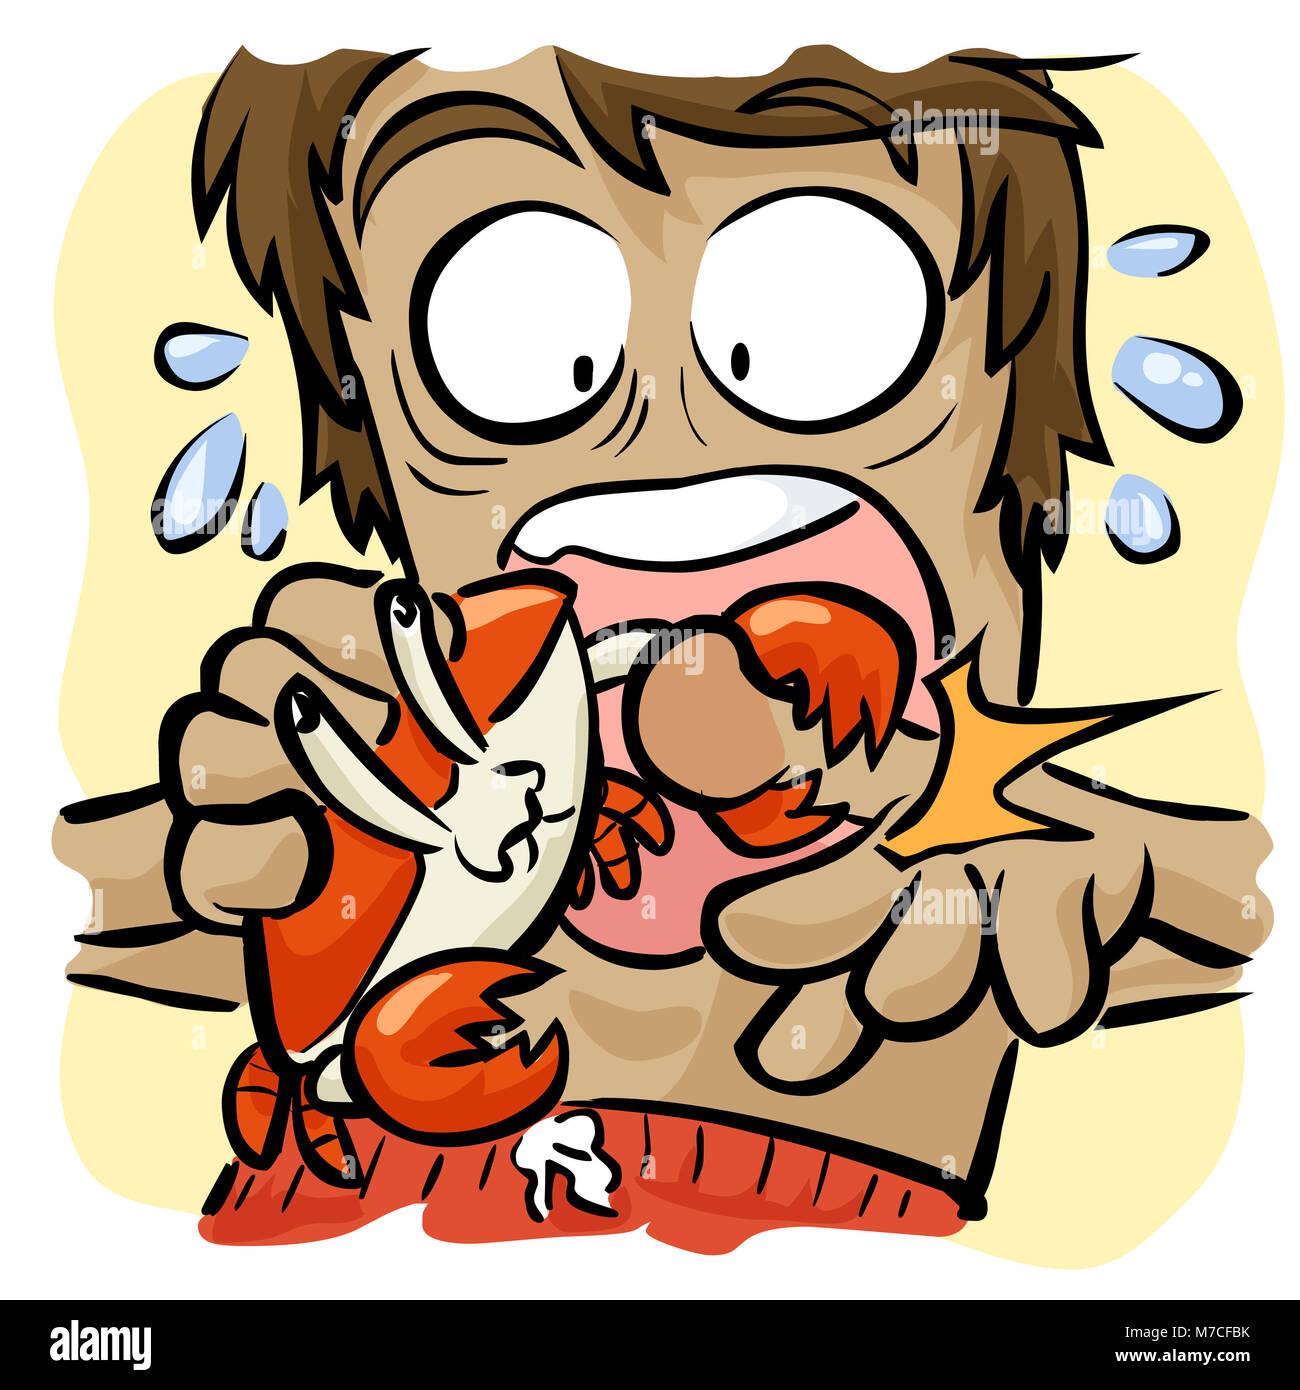 Close-up of a crab biting a man's thumb - Stock Image